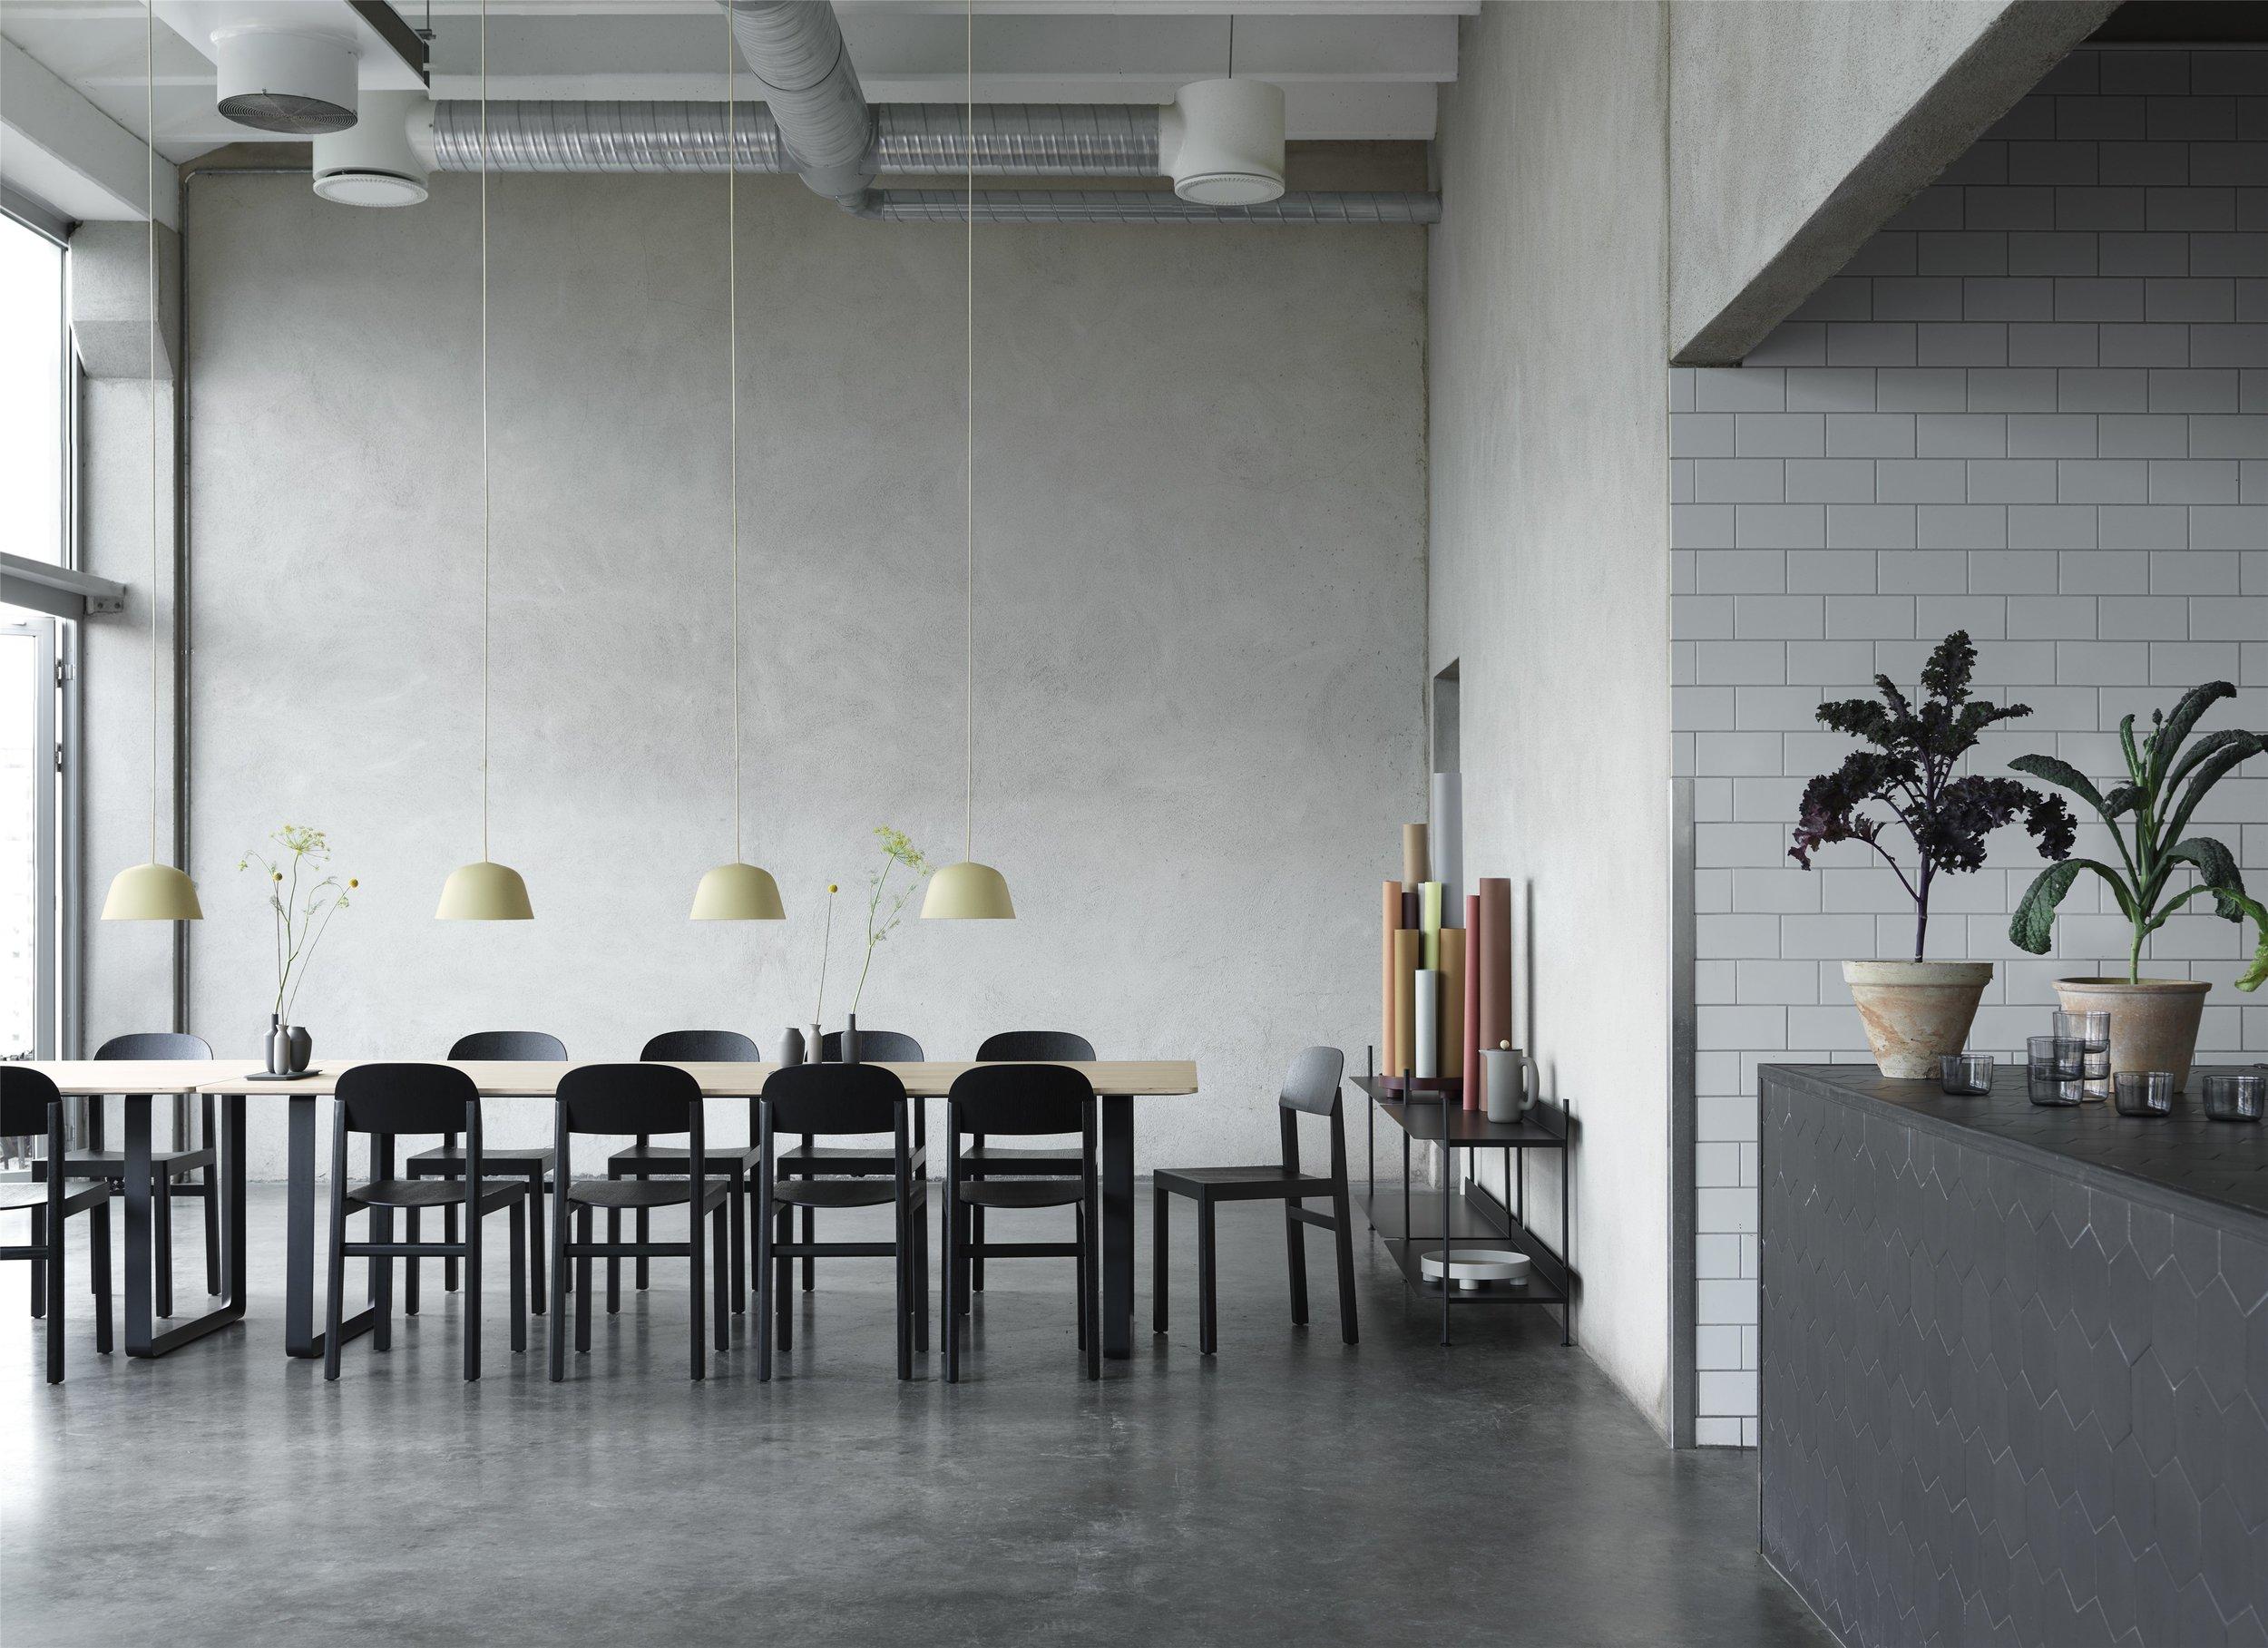 Workshop-chair-black-70-70-oak-ambit-ø25-compile-balance-push-corky_(150).jpg